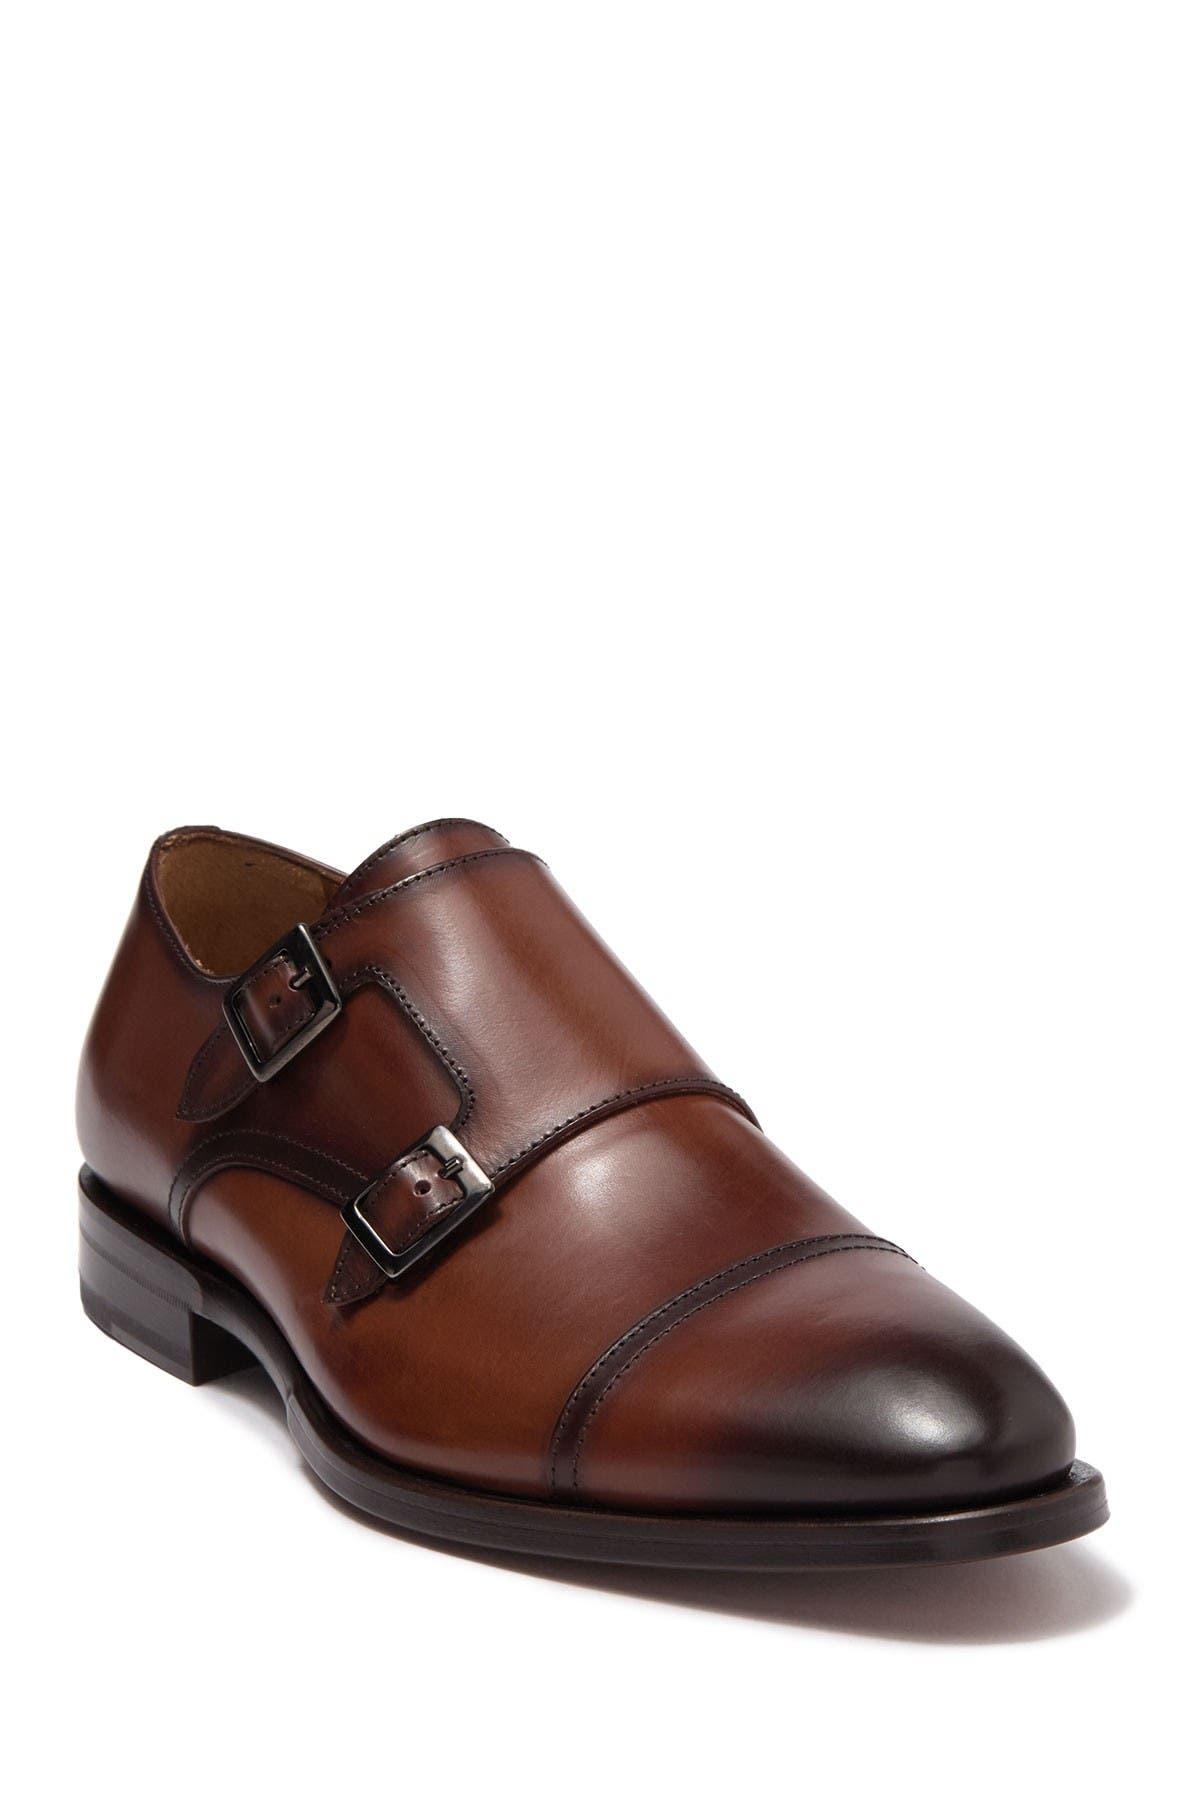 Image of Antonio Maurizi Cap Toe Double Monk Strap Dress Shoe